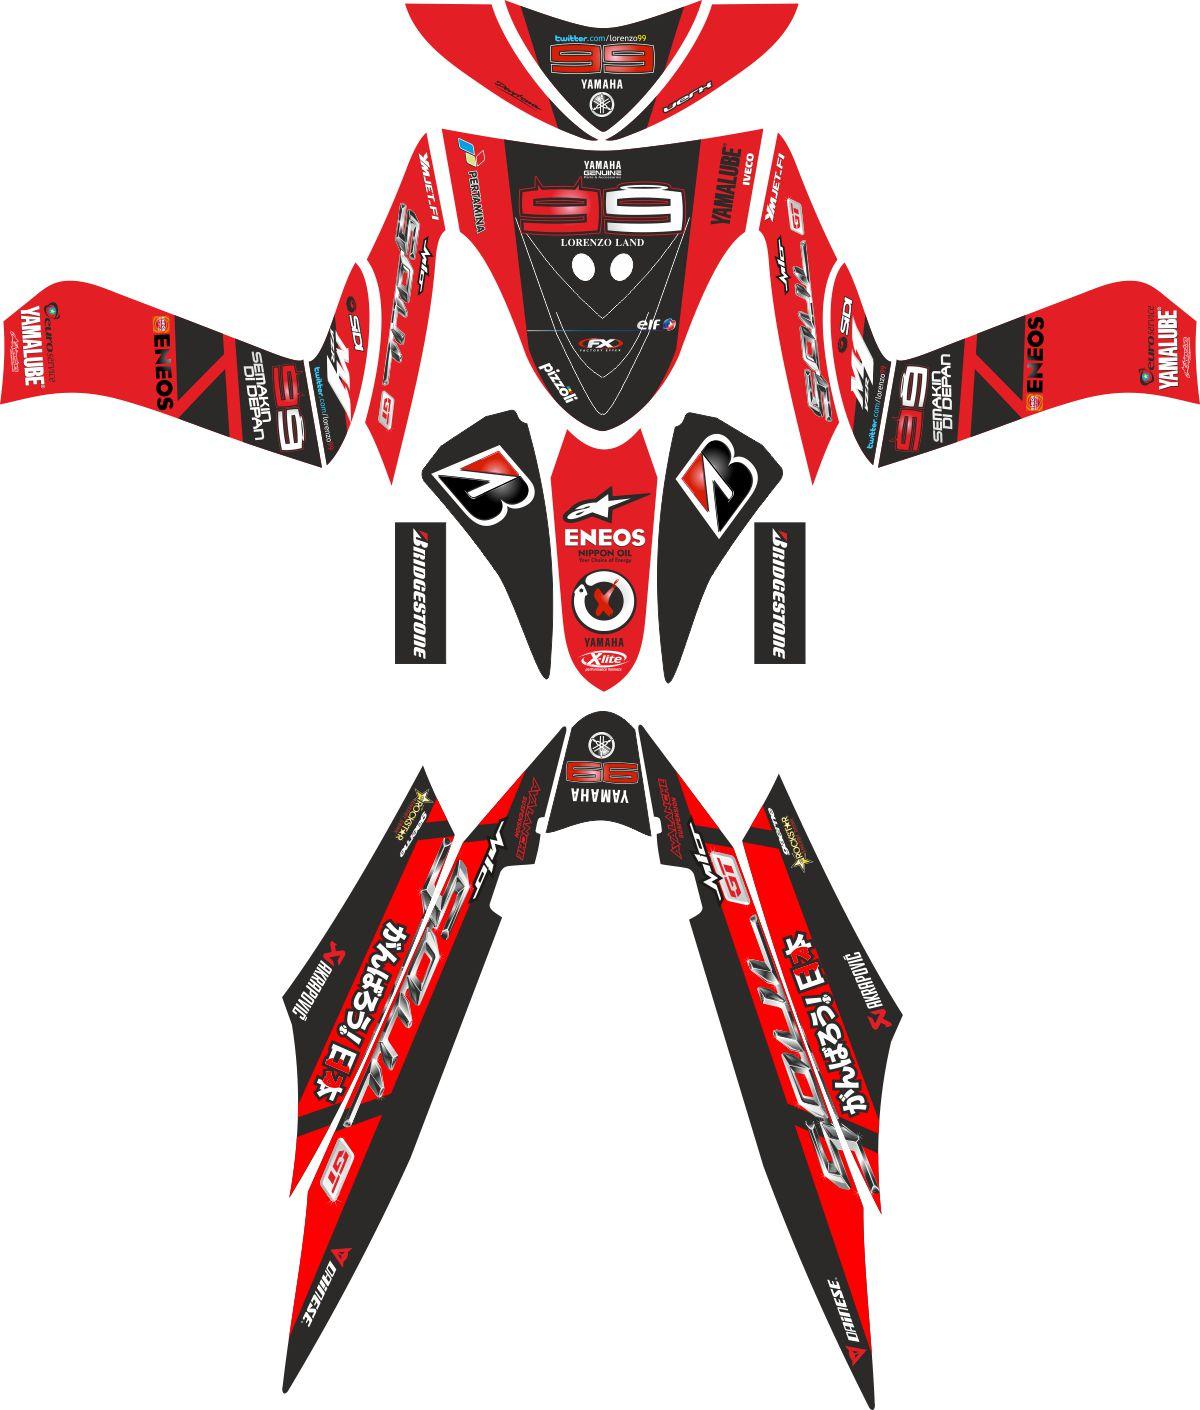 Комплект наклеек на скутер YAMAHA SOUL 2010